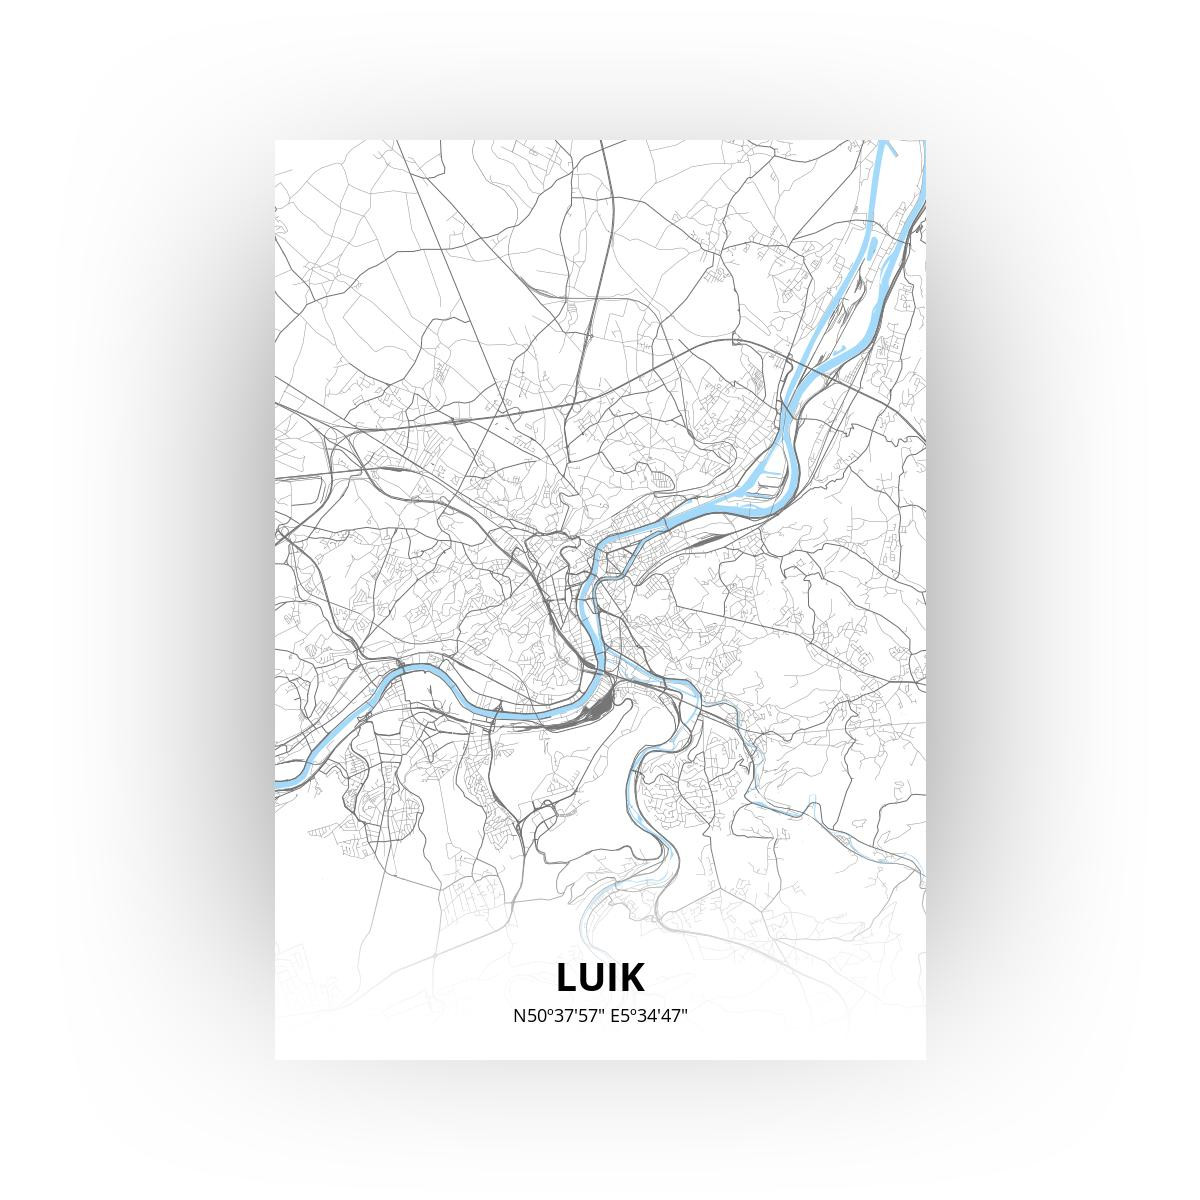 Luik print - Standaard stijl